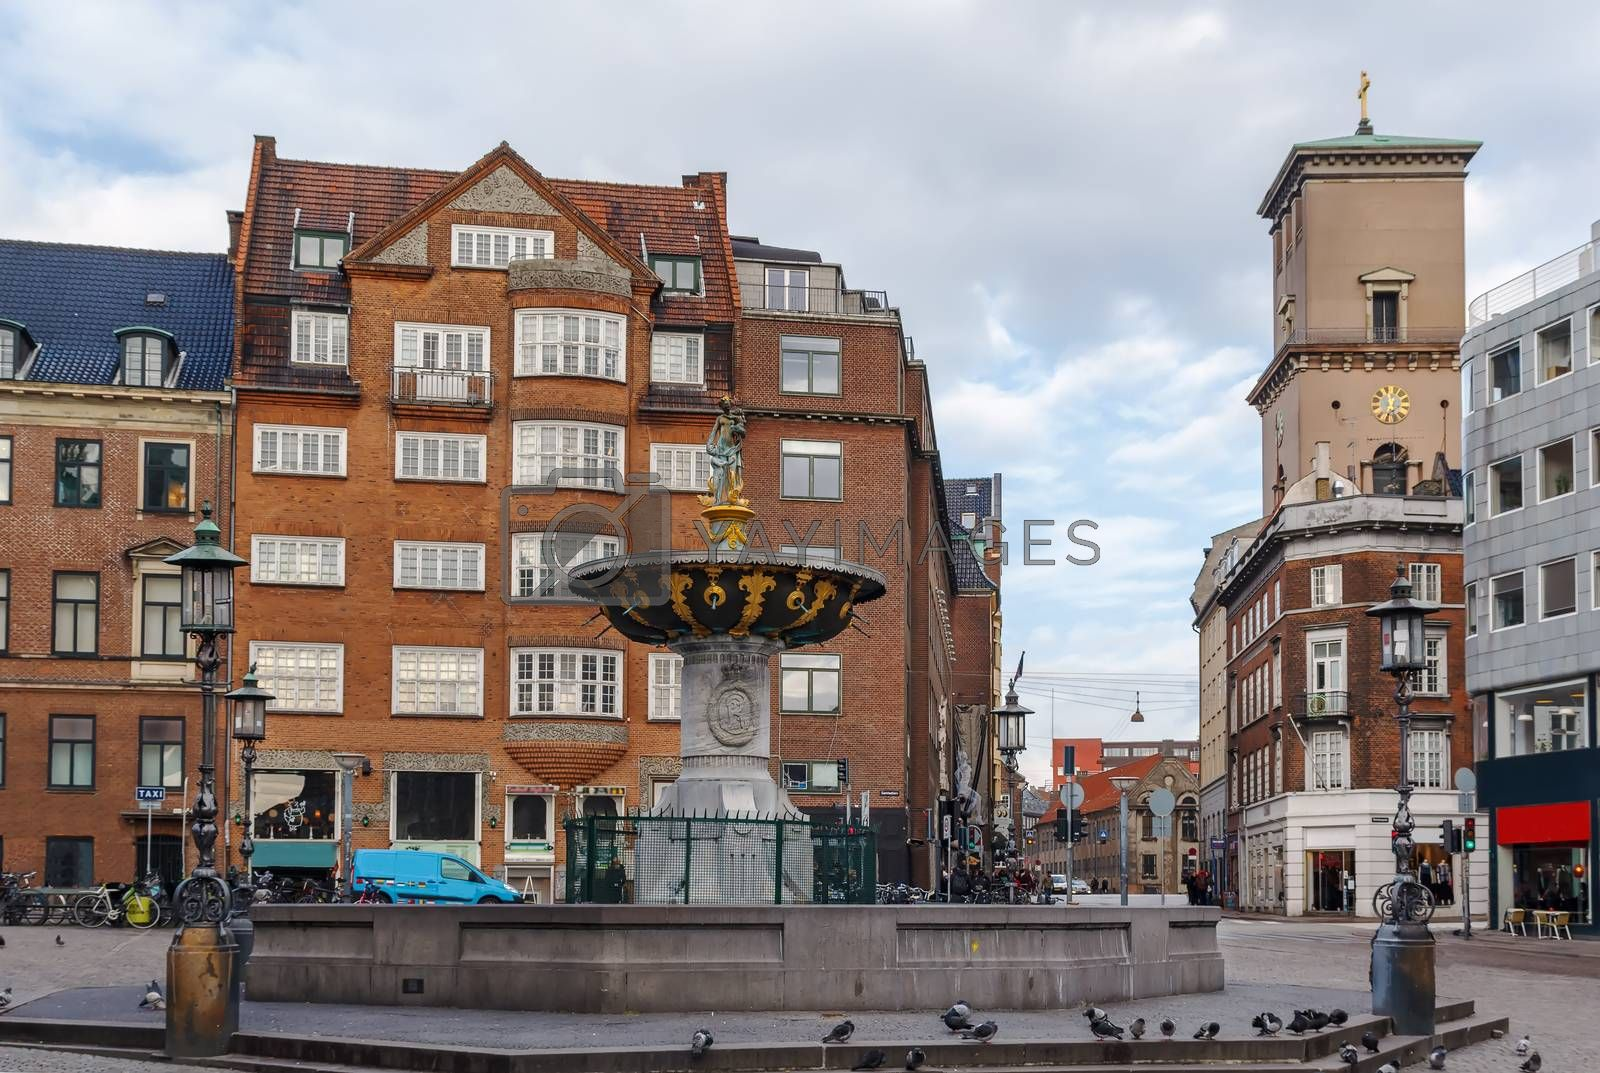 Squere in Copenhagen, Denmark by borisb17